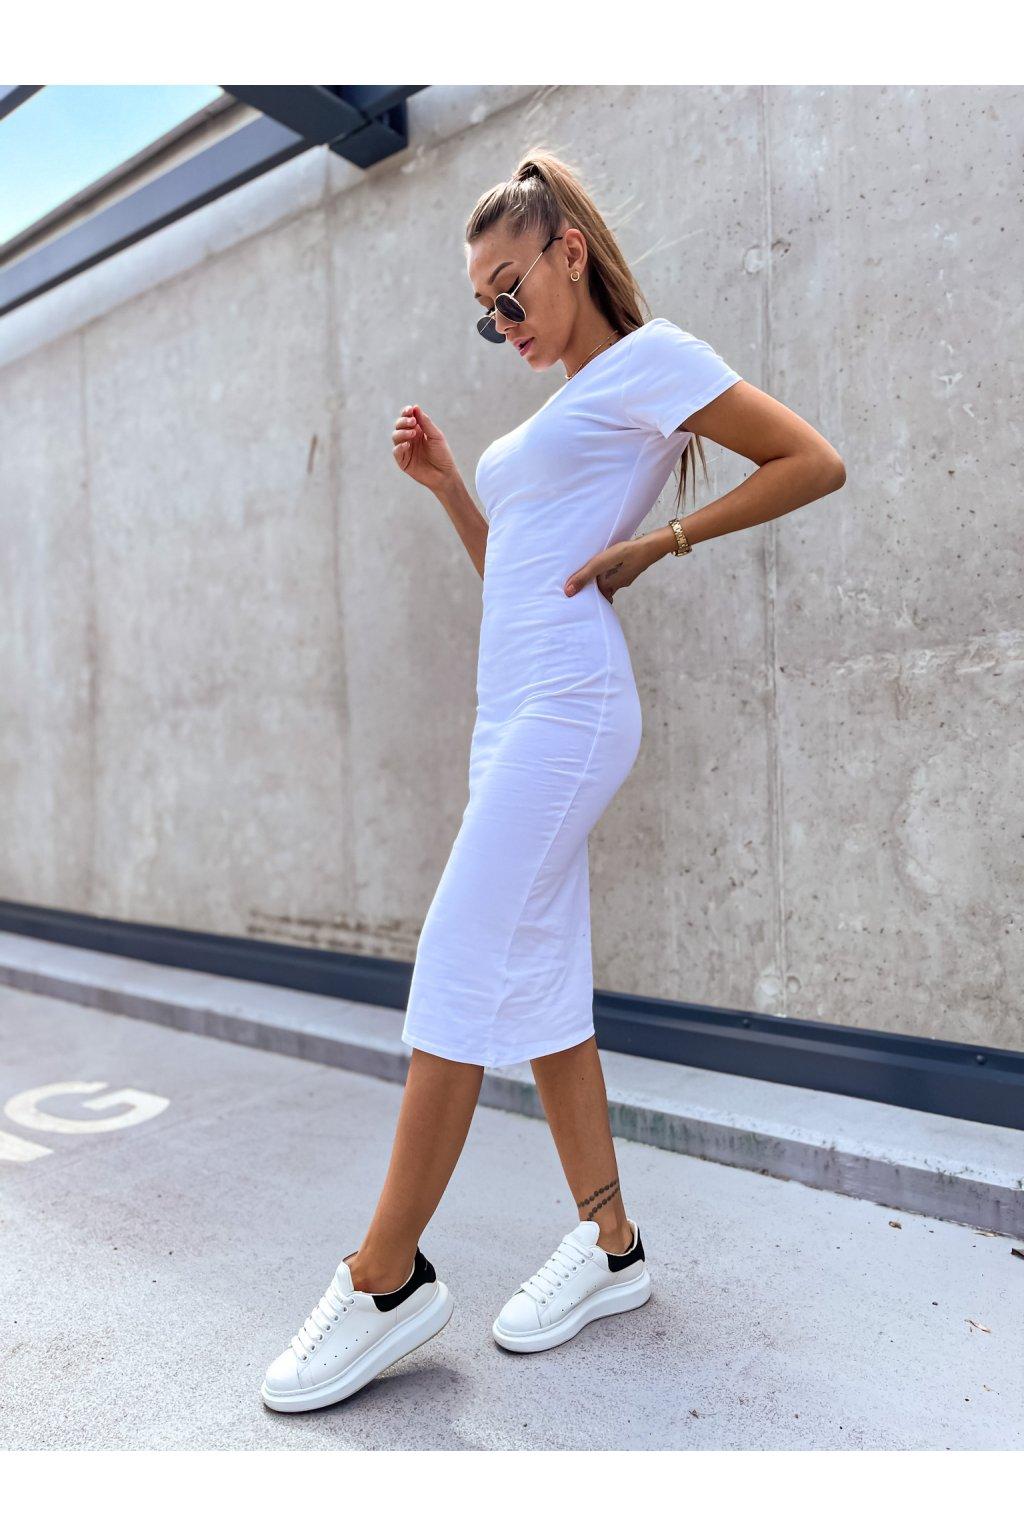 damske saty maxi short sleeve white eshopat cz 1